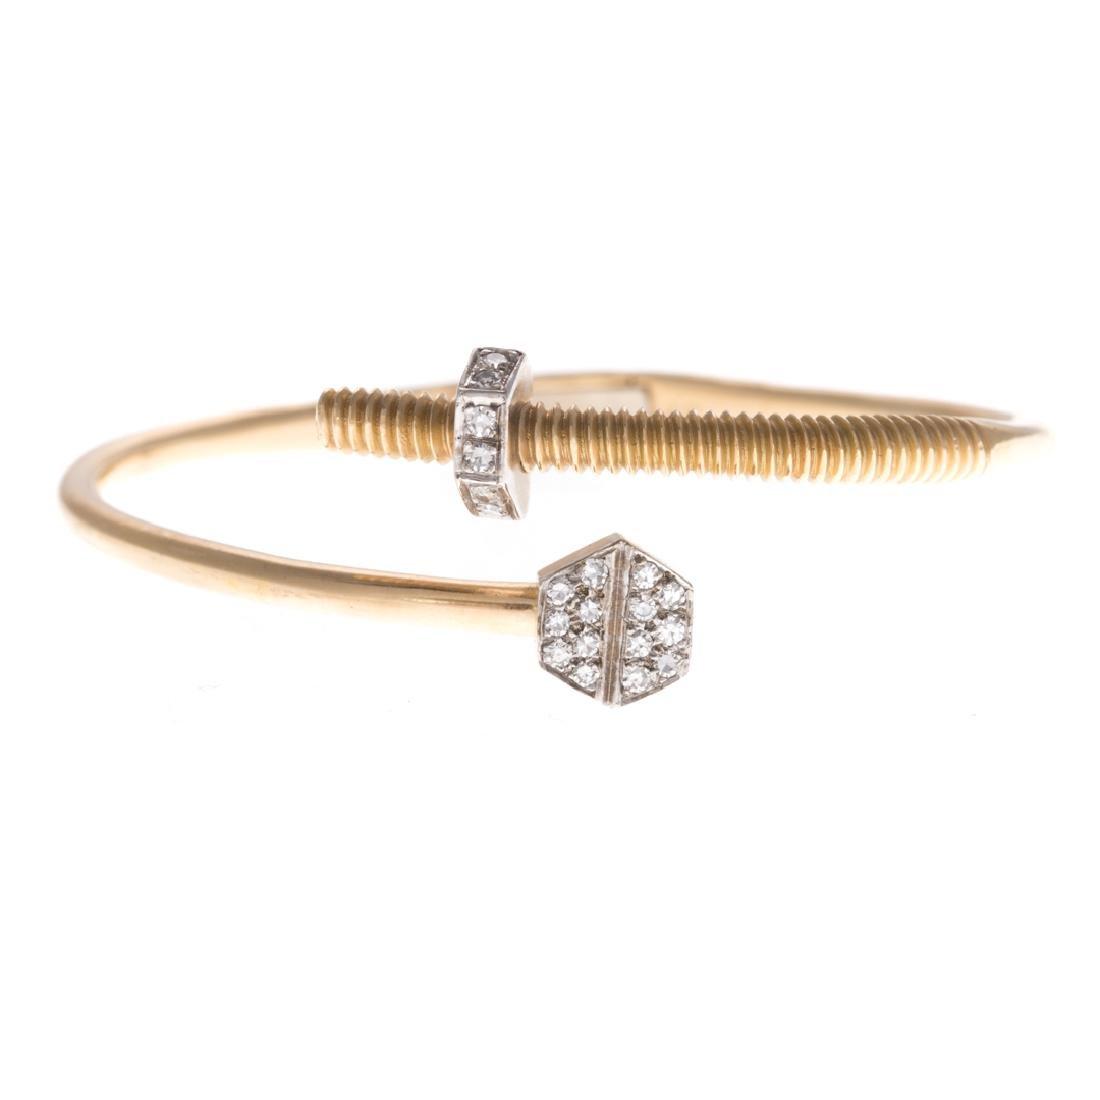 A Gold and Diamond Nail & Screw Cuff Bracelet